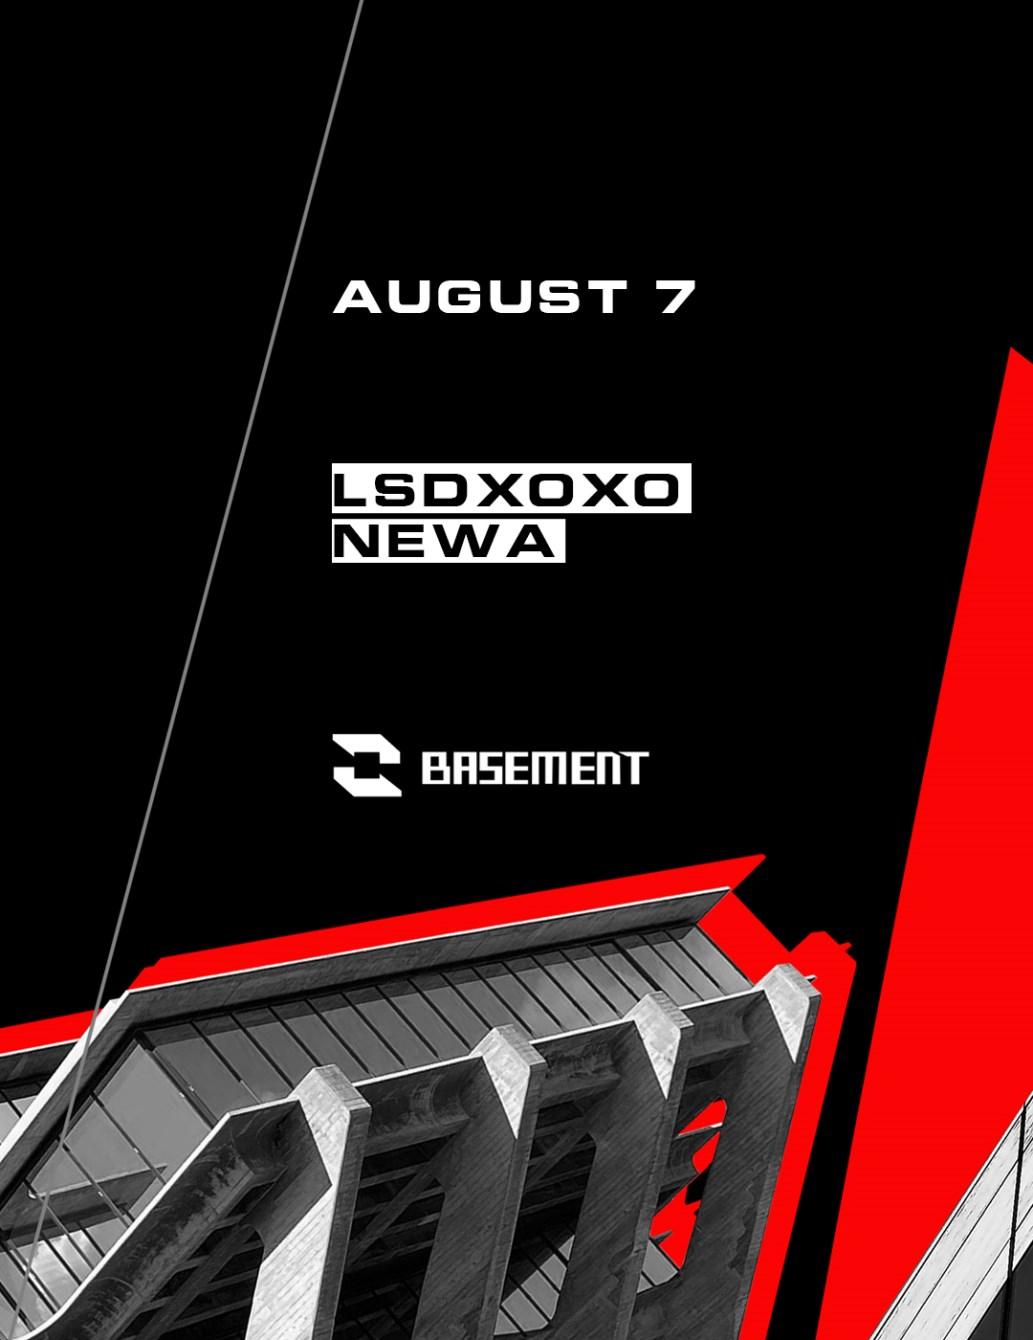 Lsdxoxo / Newa - Flyer front